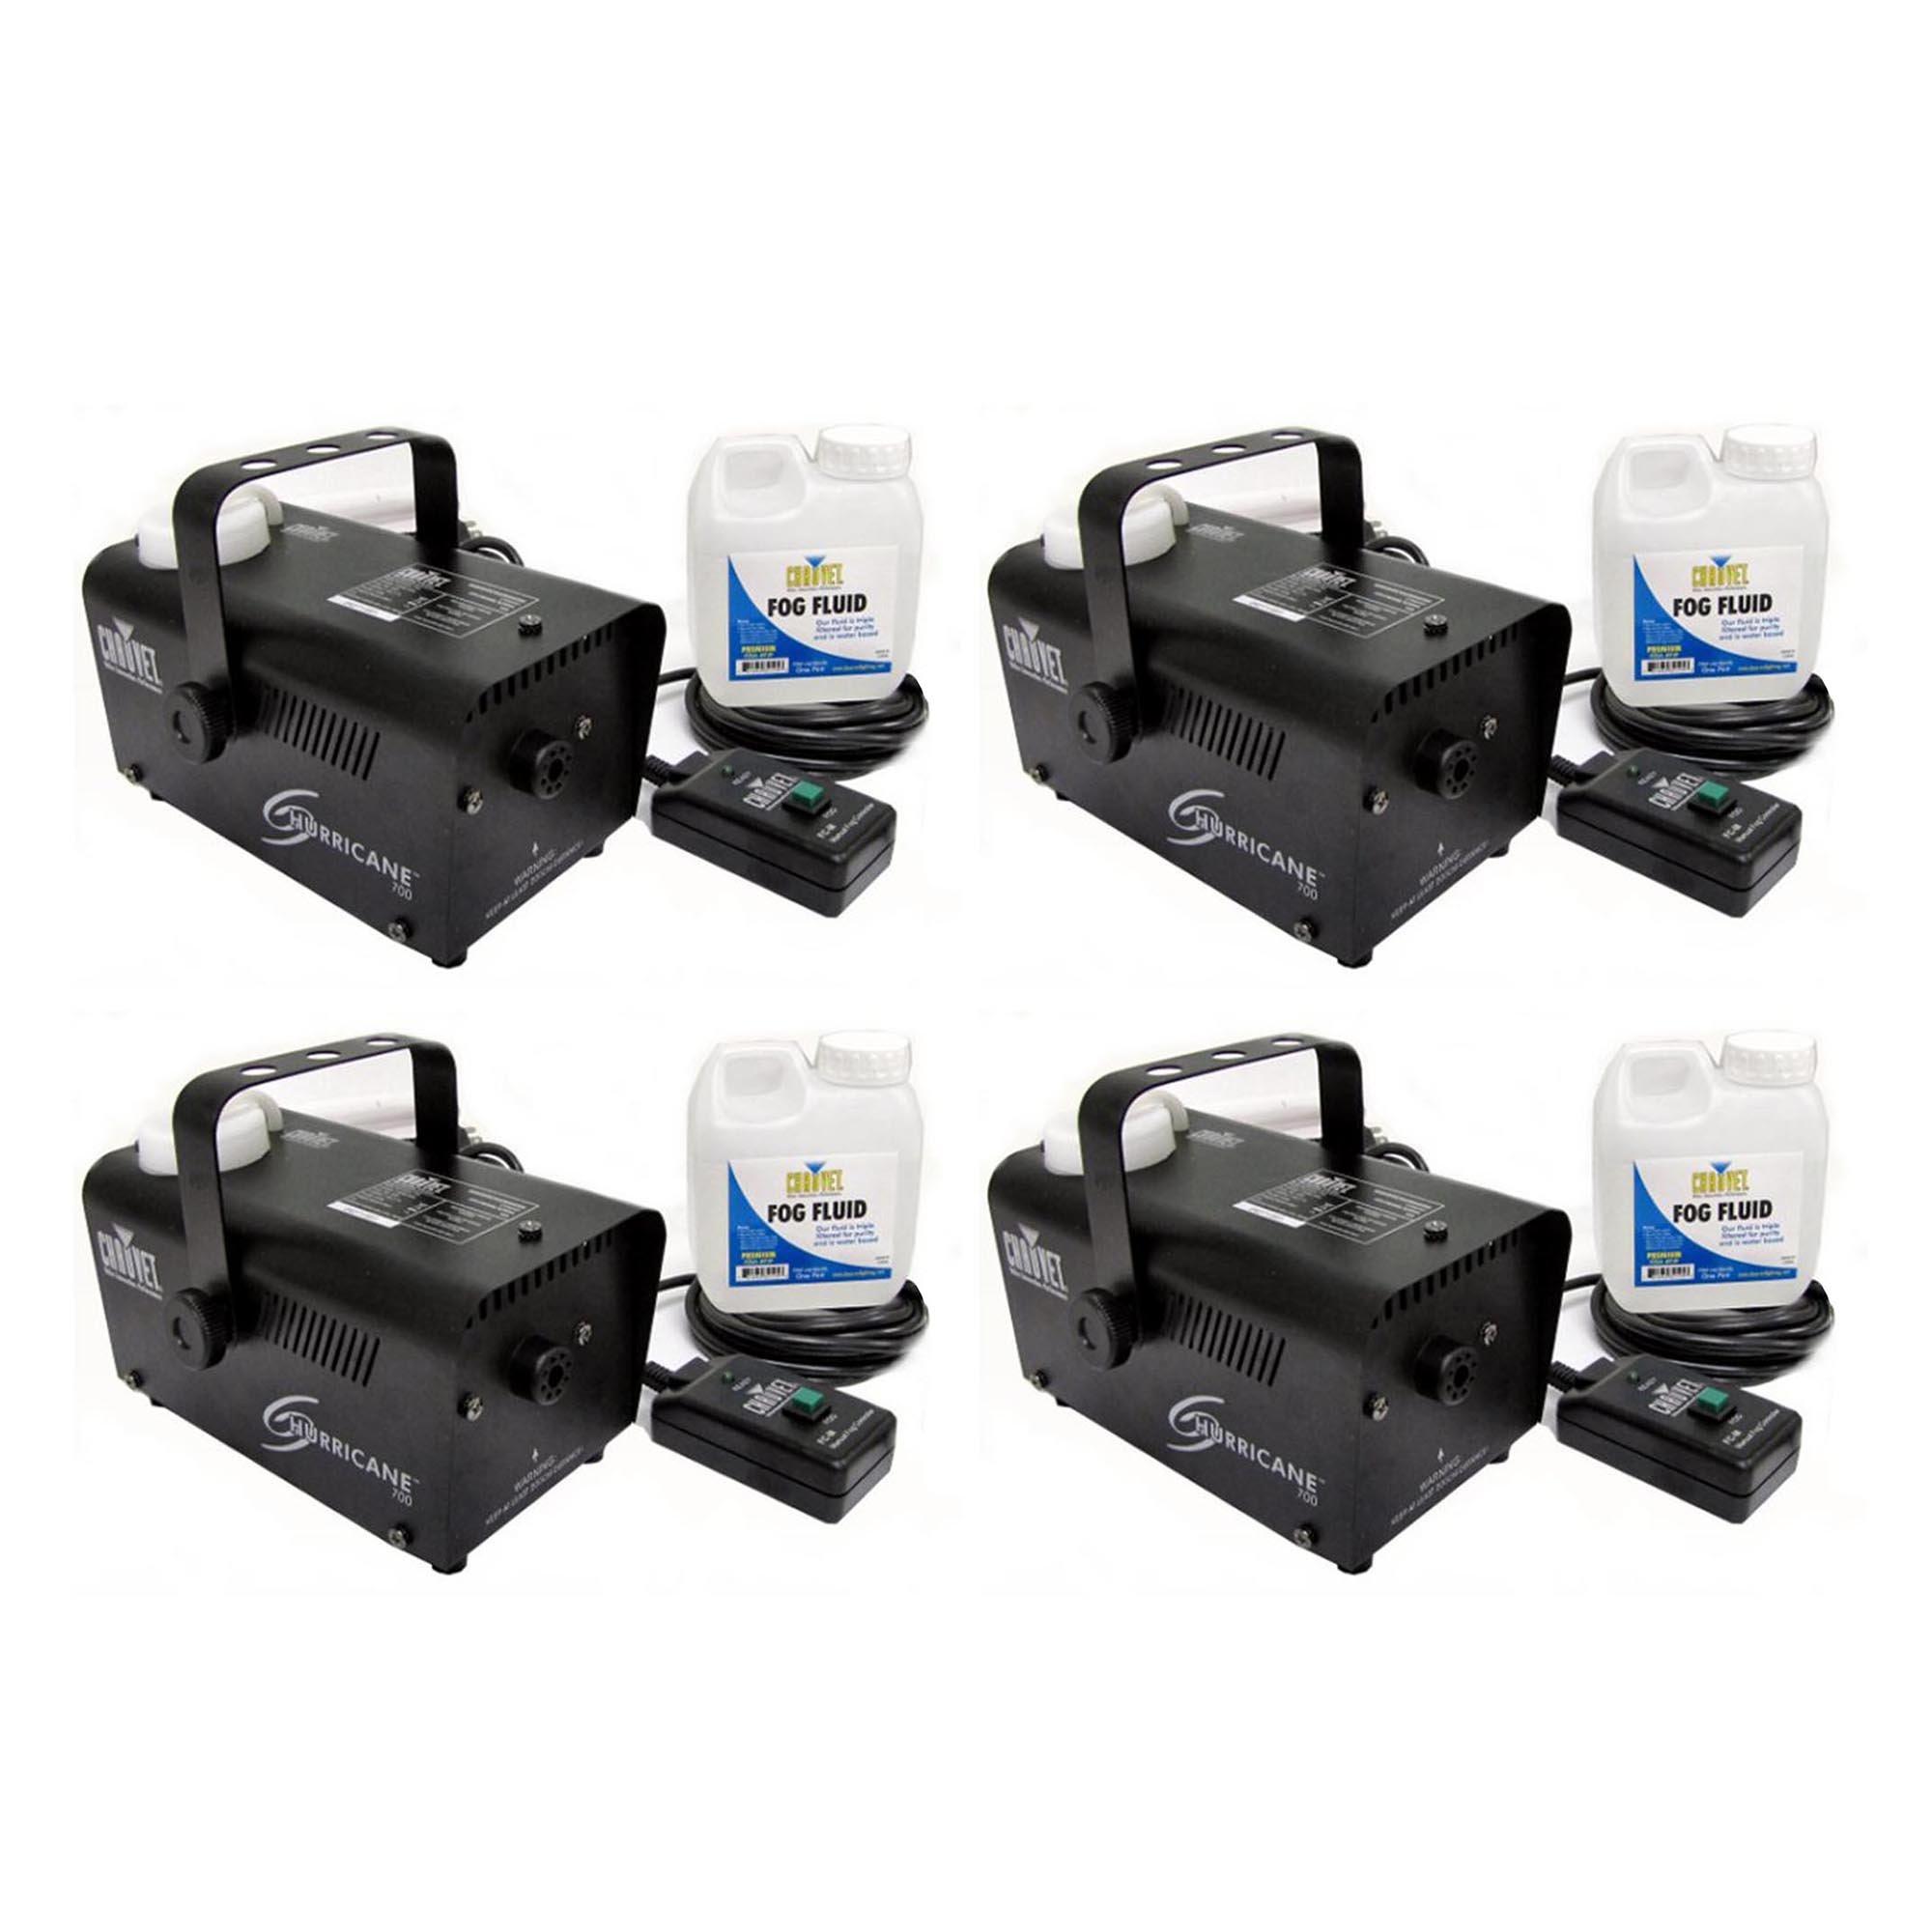 (4) CHAUVET HURRICANE H700 Fog/Smoke Pro Machines w/ Fog Fluid & Remote | H-700